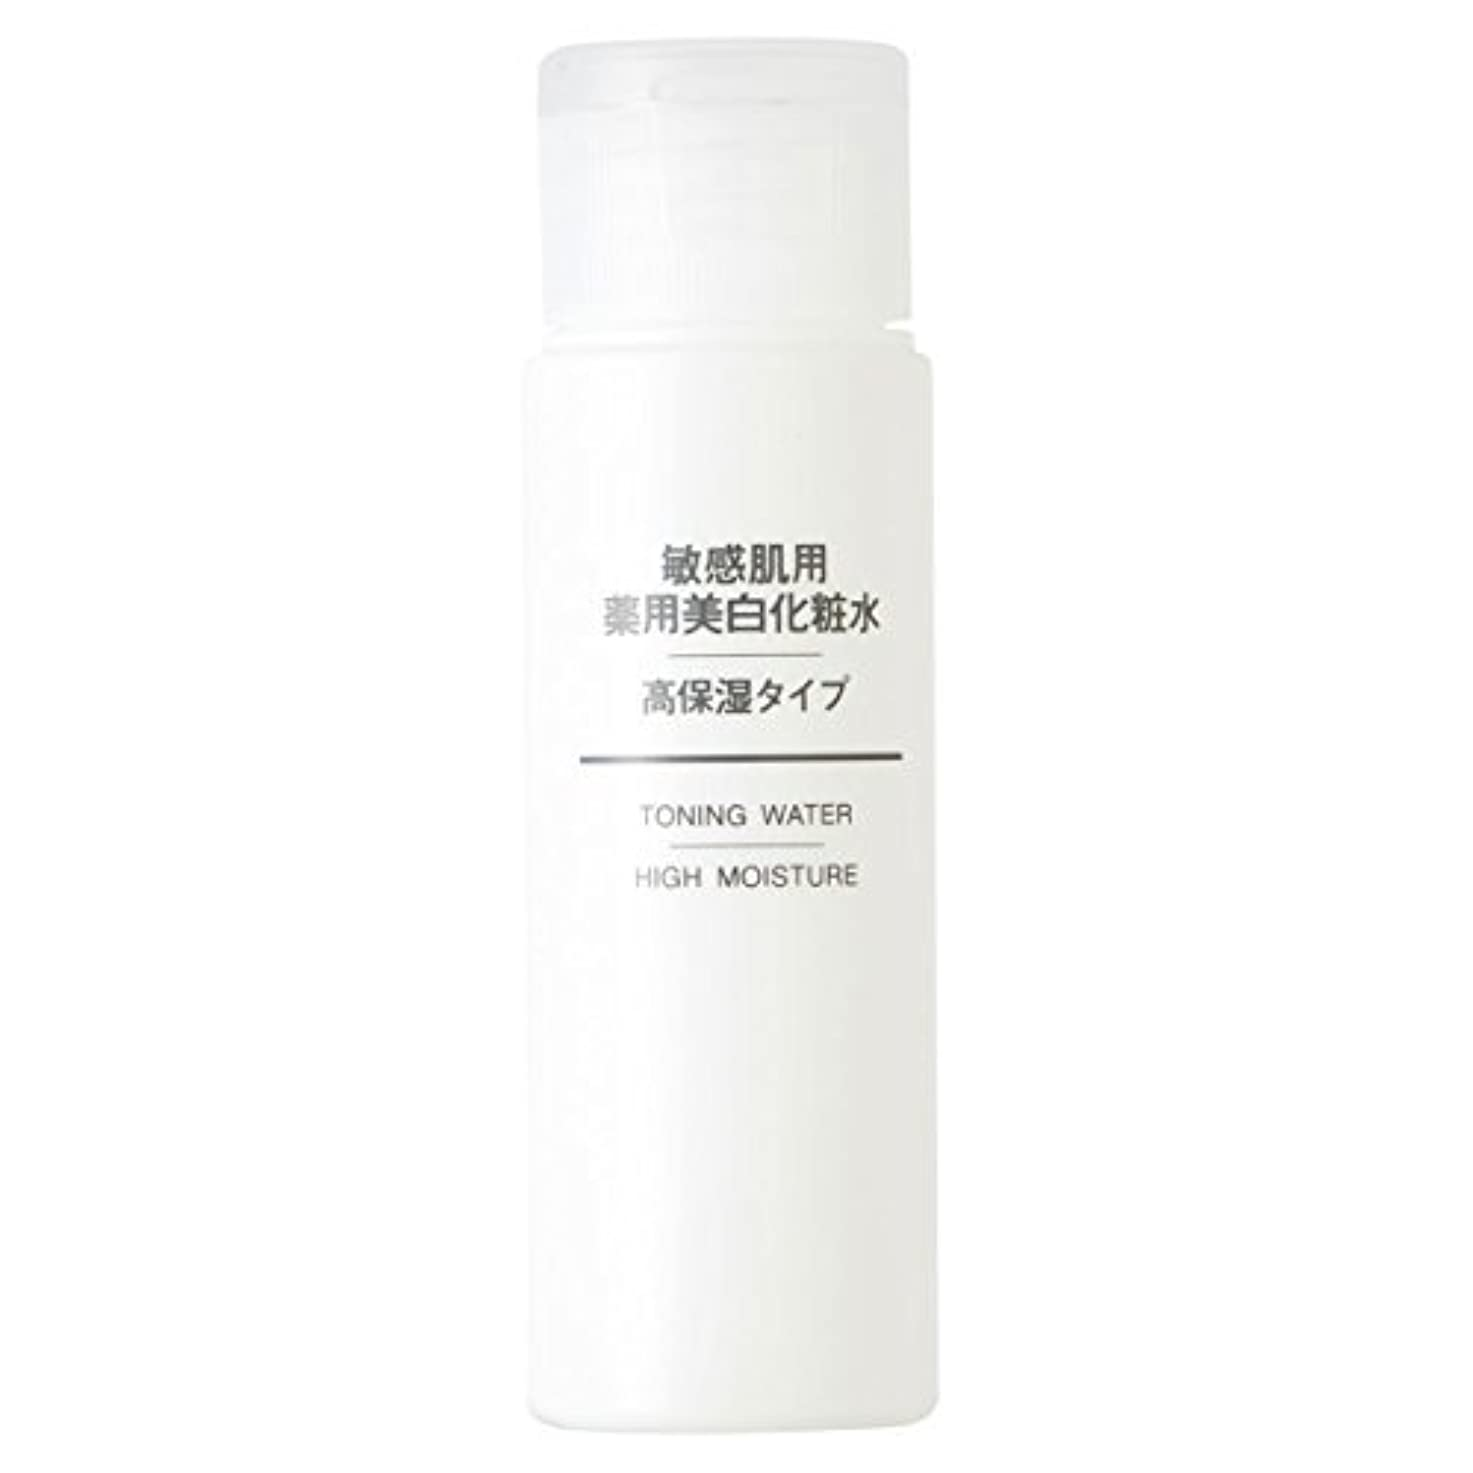 干渉居心地の良い材料無印良品 敏感肌用 薬用美白化粧水 高保湿タイプ(携帯用) (新)50ml